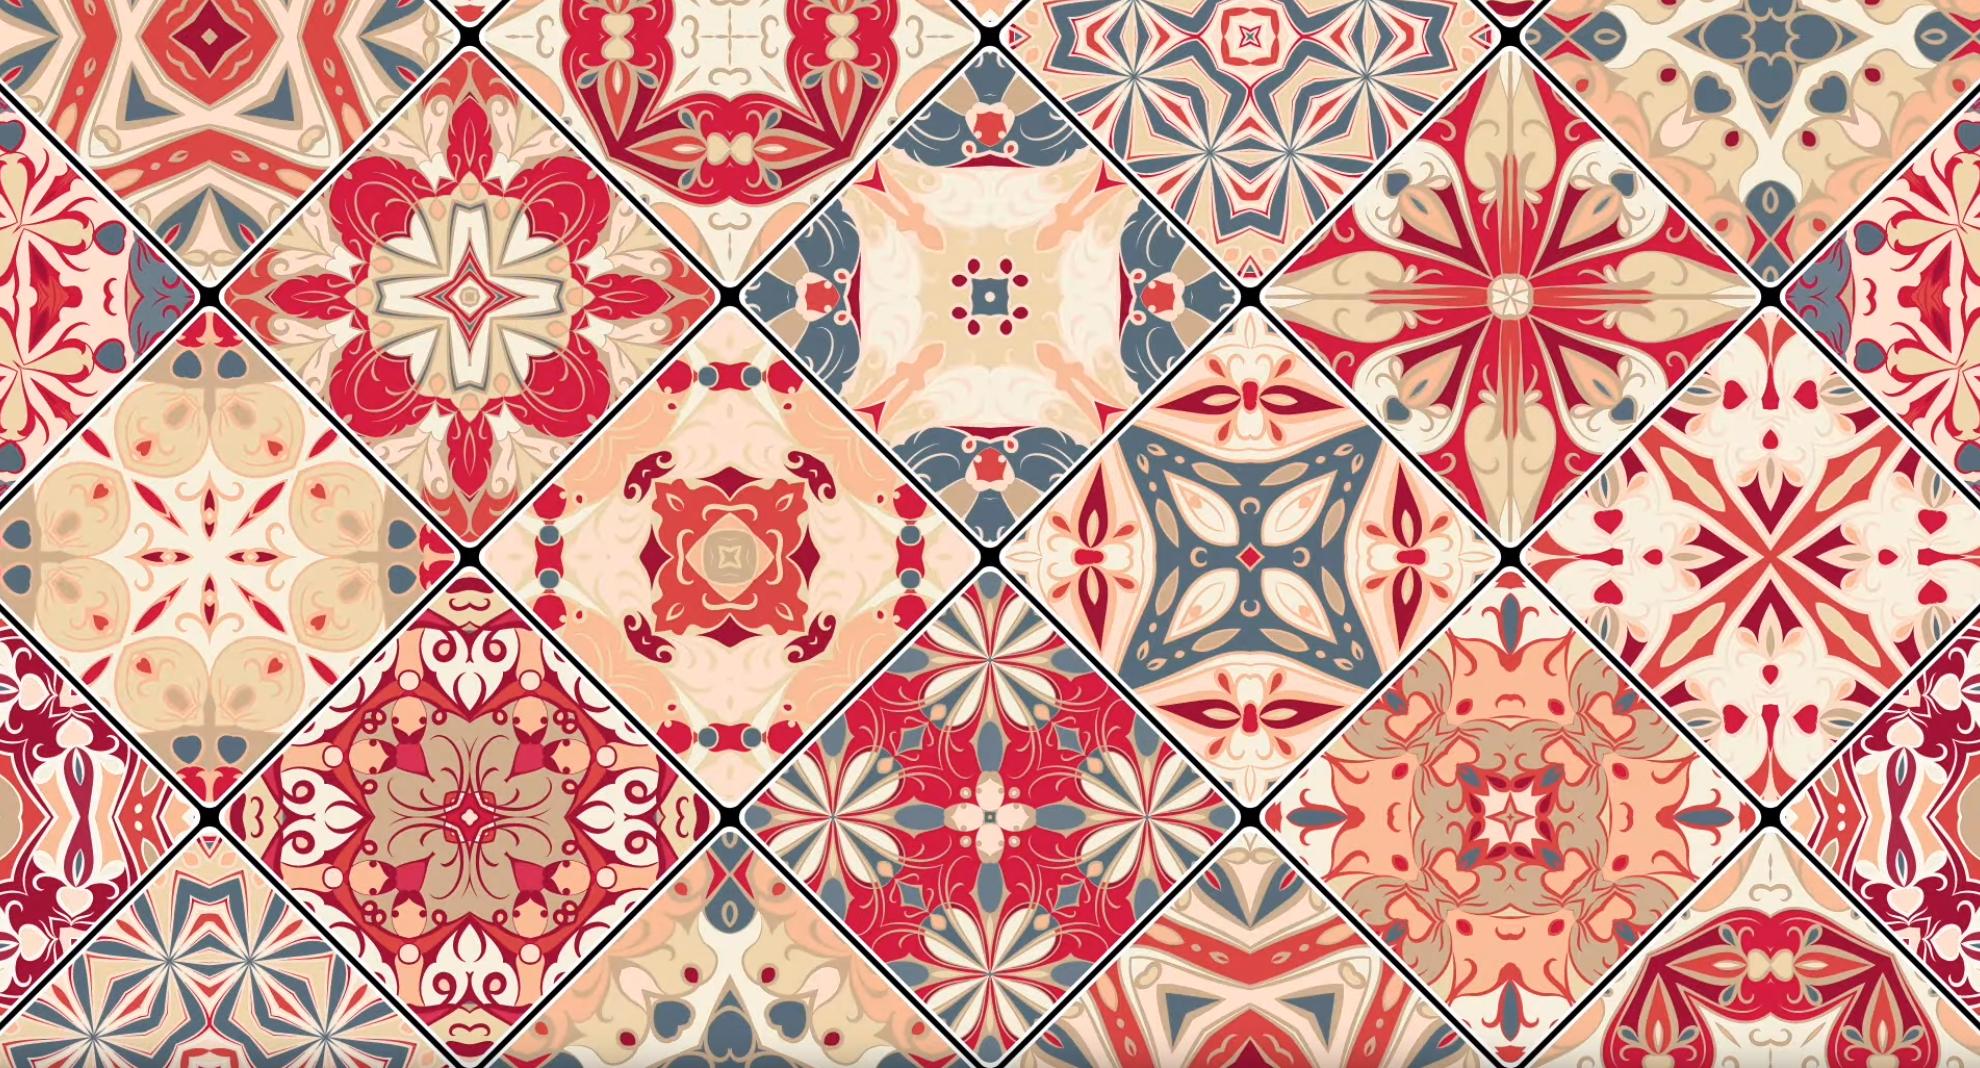 techcrunch.com - Frederic Lardinois - Adobe shows off new color palette experiment for Illustrator